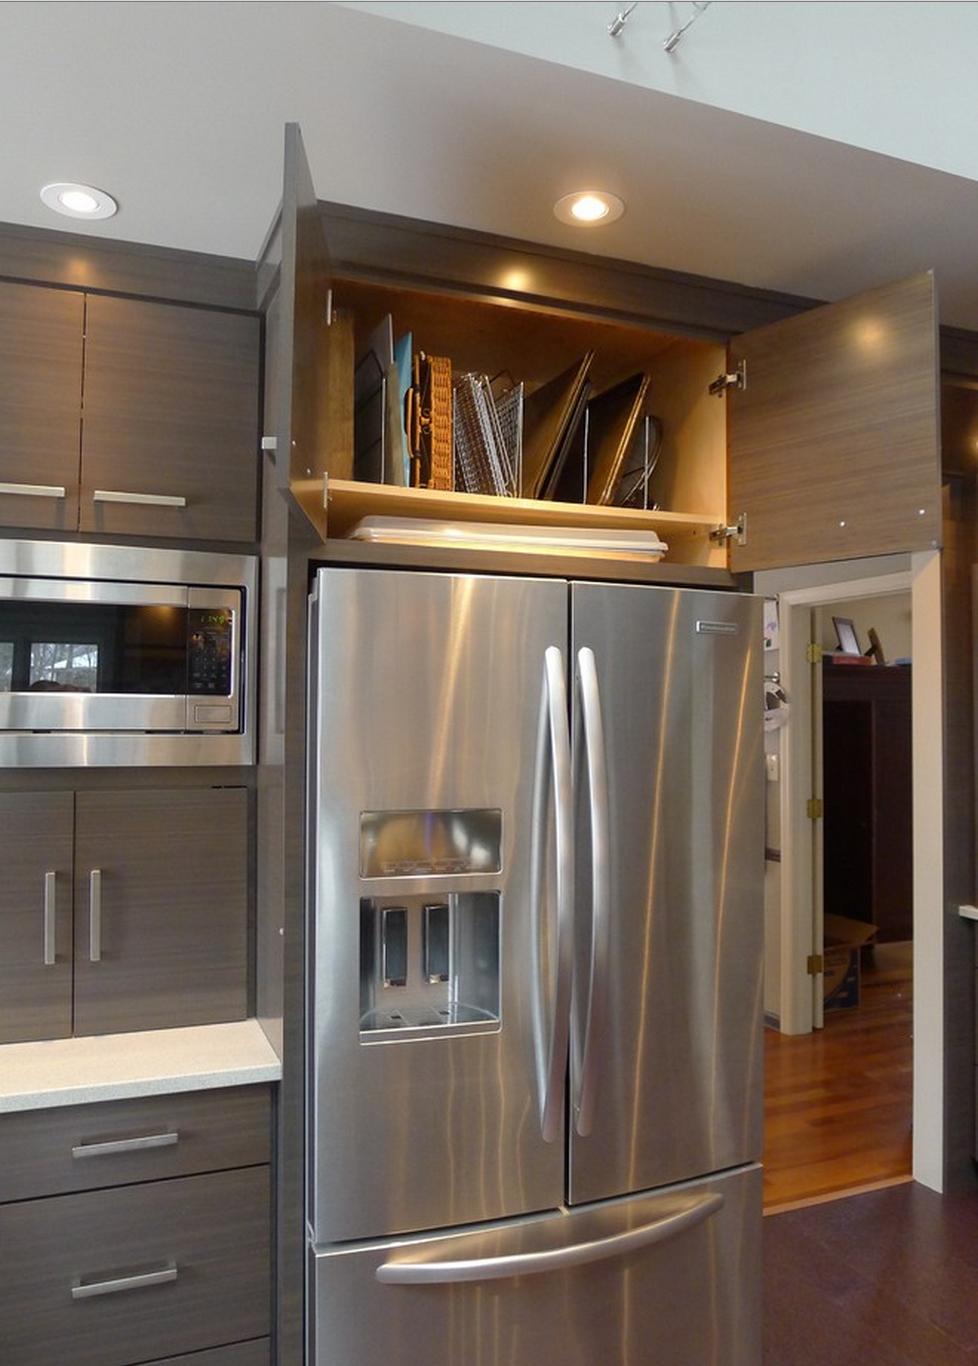 Floor to ceiling cabinets | Floor to ceiling cabinets ...